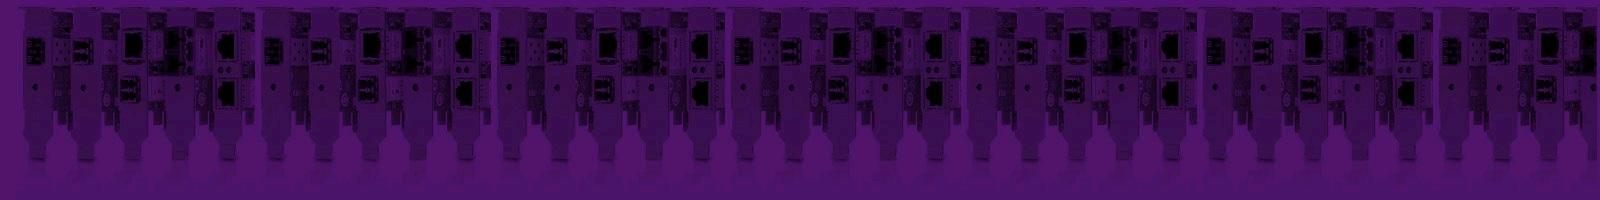 Fibre LAN Adapters